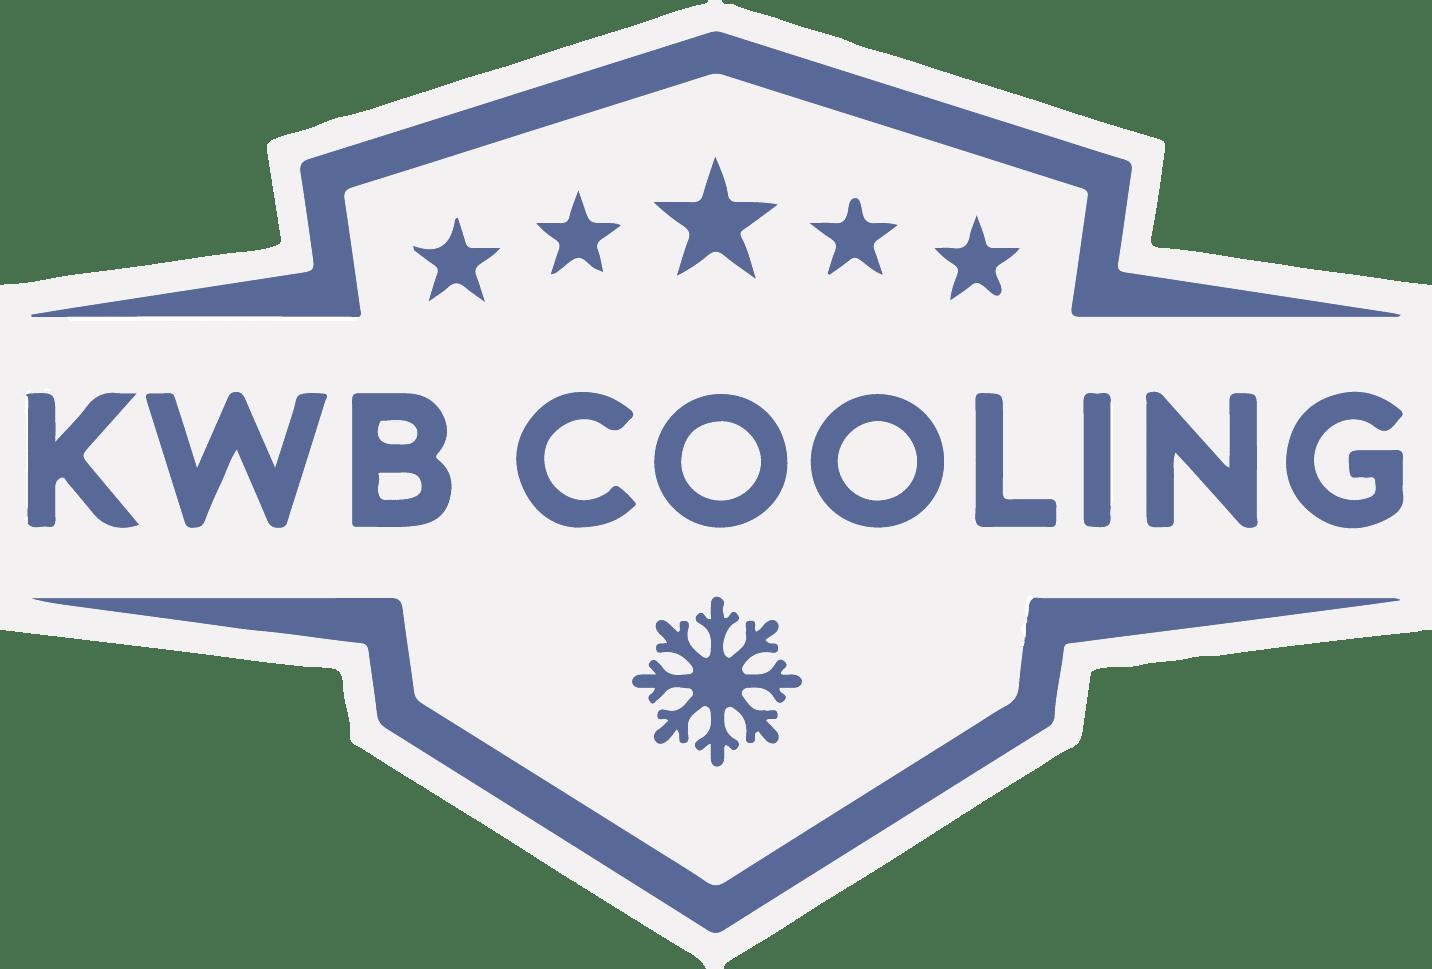 KWB Cooling